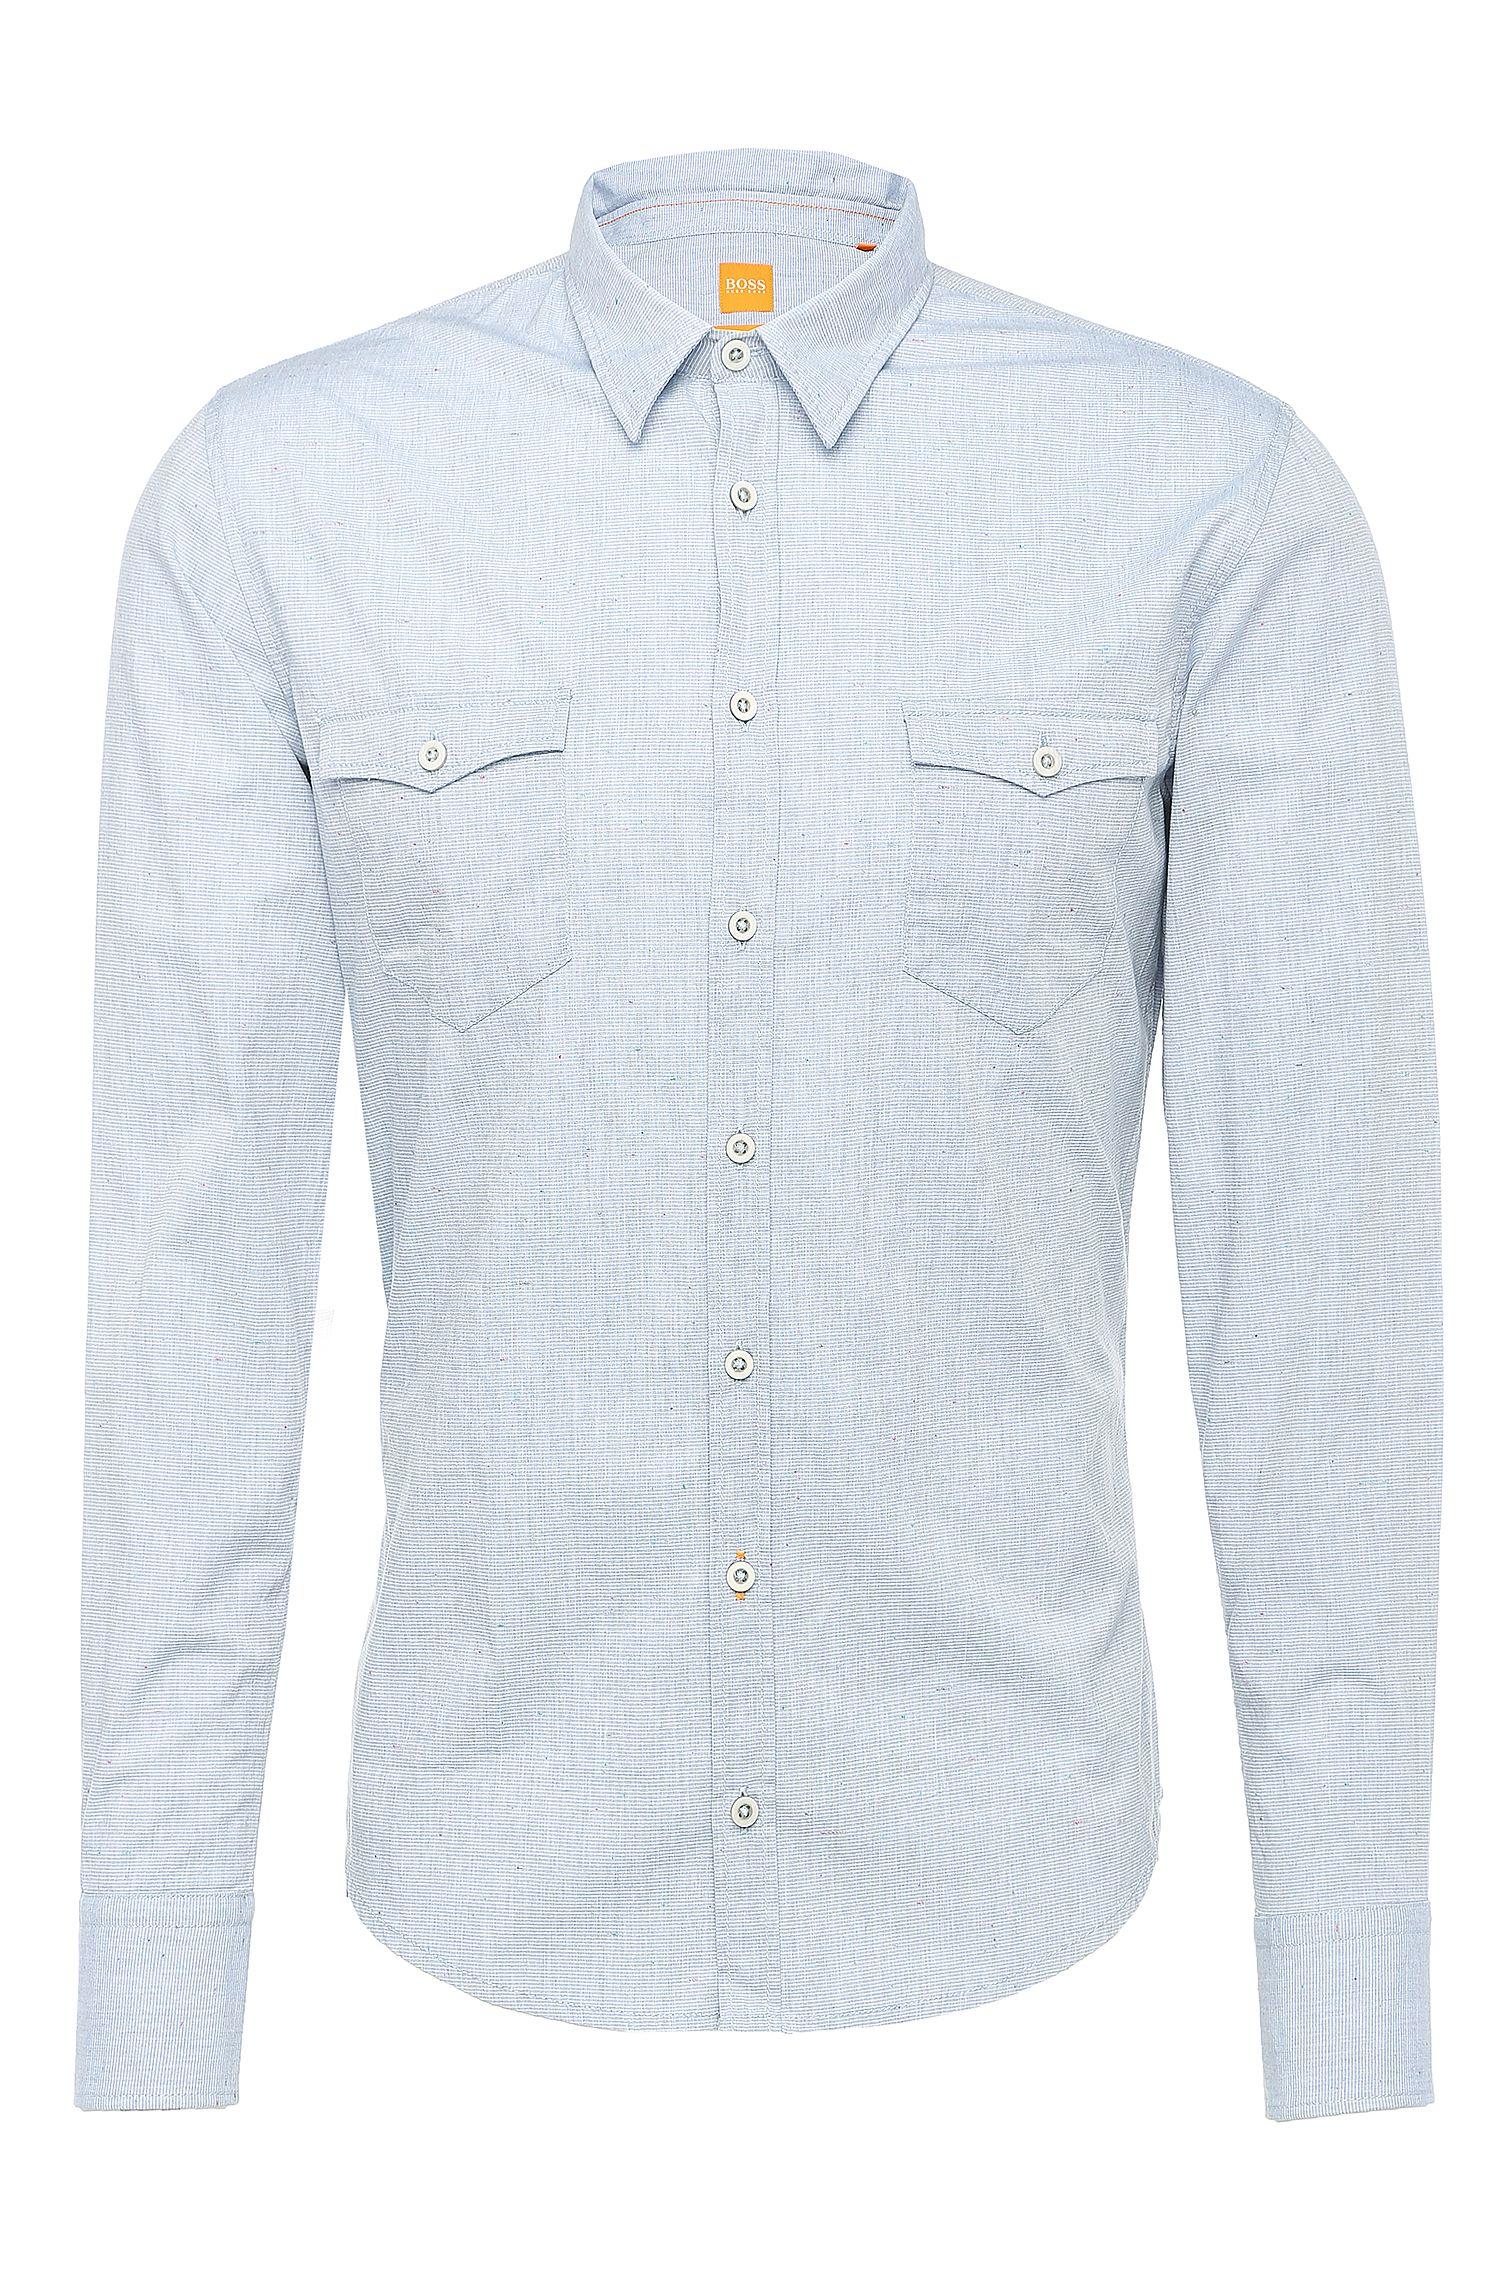 'EdoslimE' | Slim Fit, Cotton Blend Slub Contrast Button Down Shirt